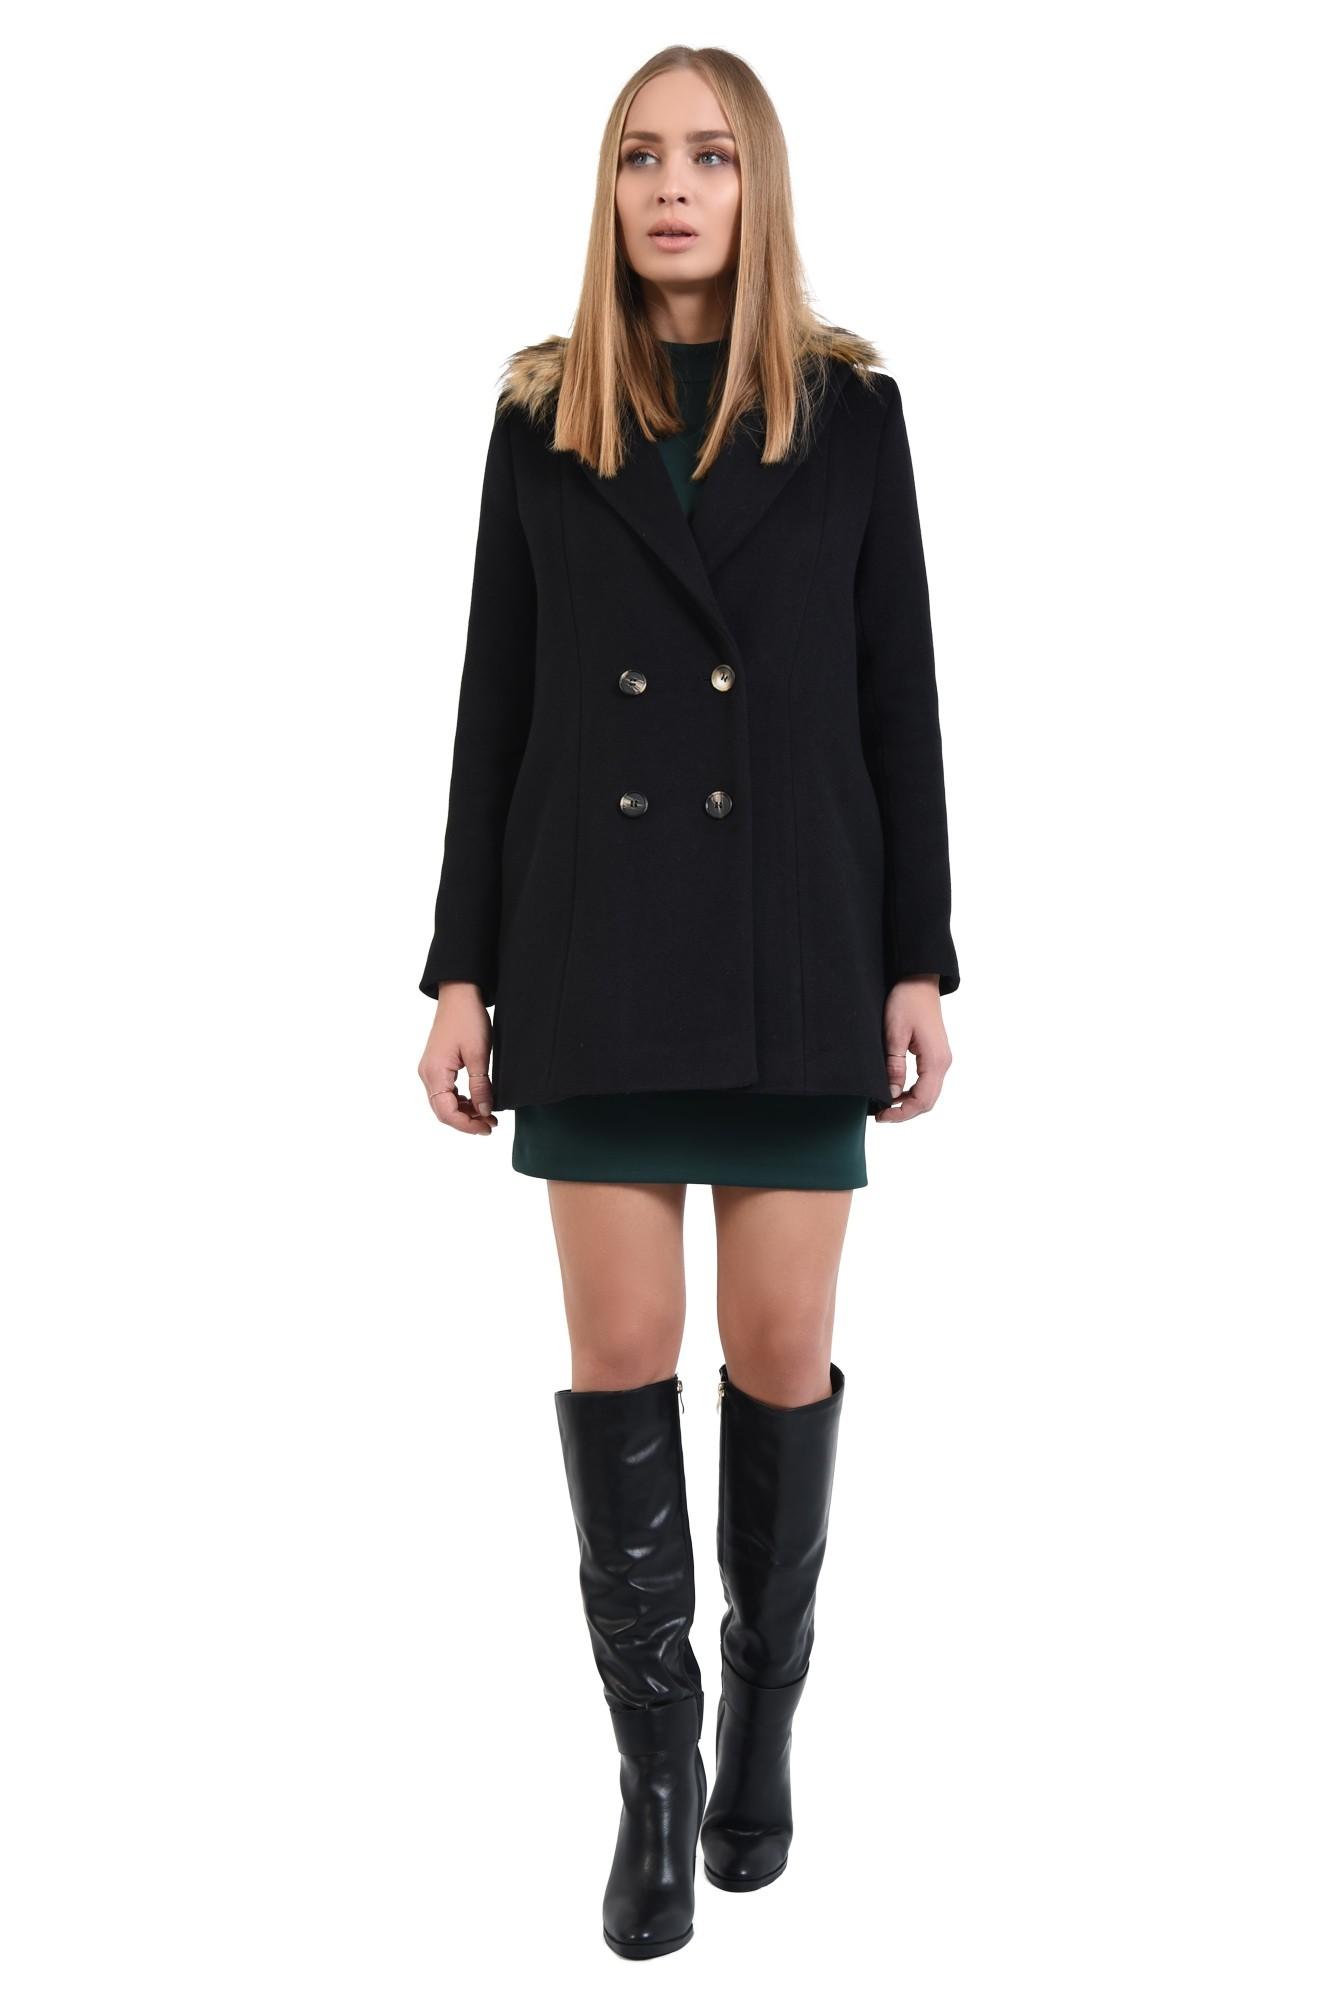 3 - 360 - palton negru, croi drept, nasturi, guler detasabil